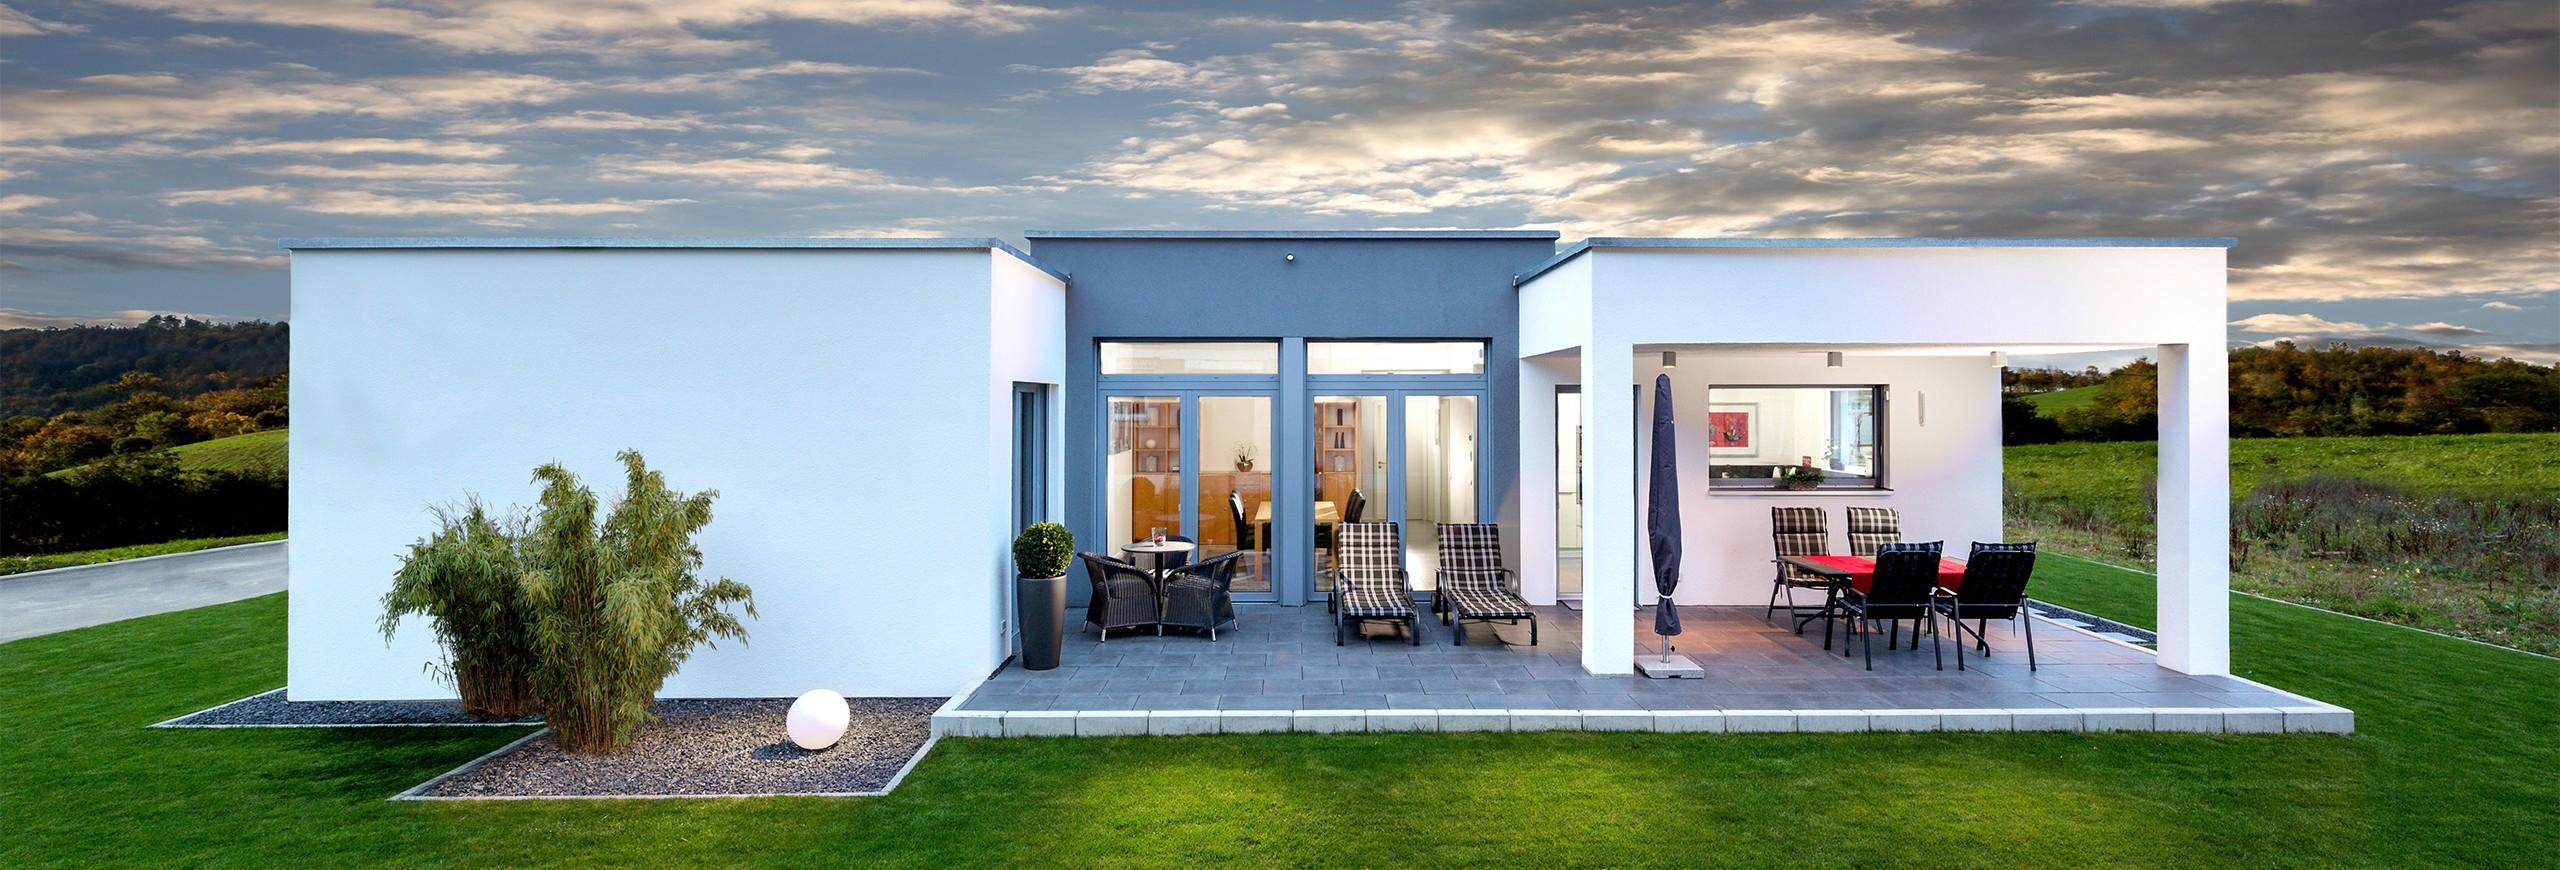 00021-Fotograf-Architektur-Achitecture-exterior-Werbefotograf-Stuttgart-Andreas-Martin